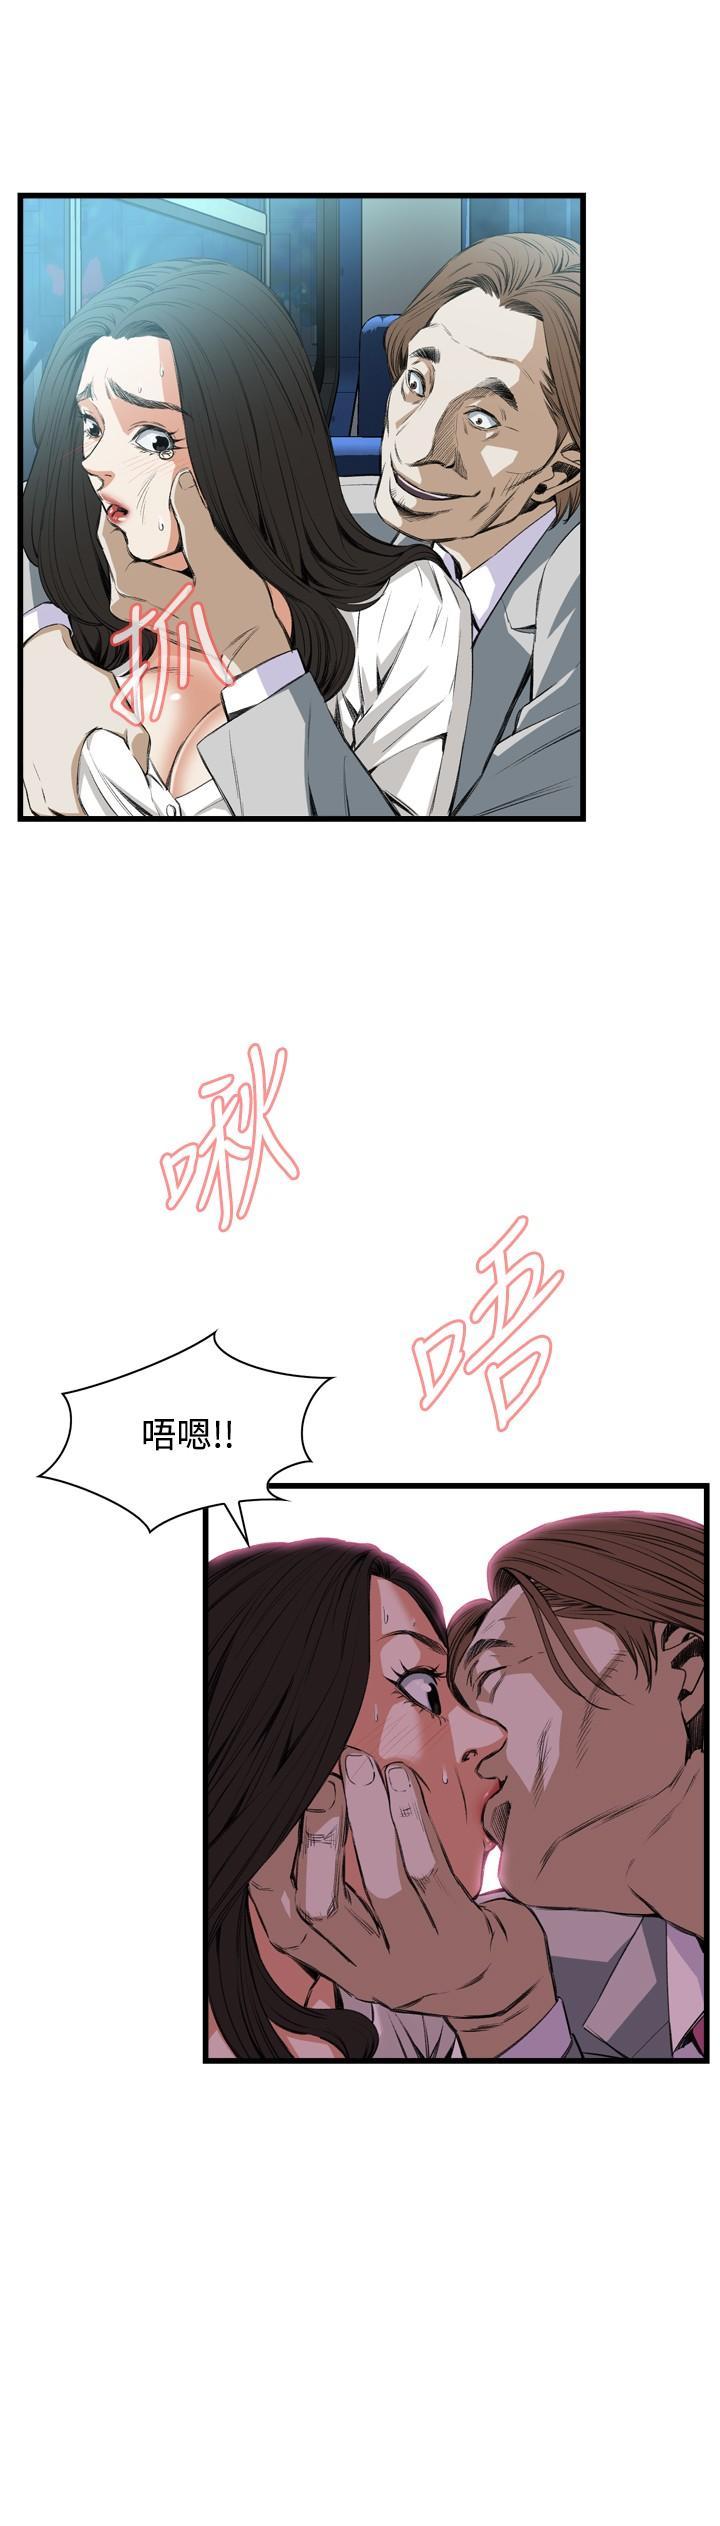 Take a Peek 偷窥 Ch.39~51 [Chinese]中文 327